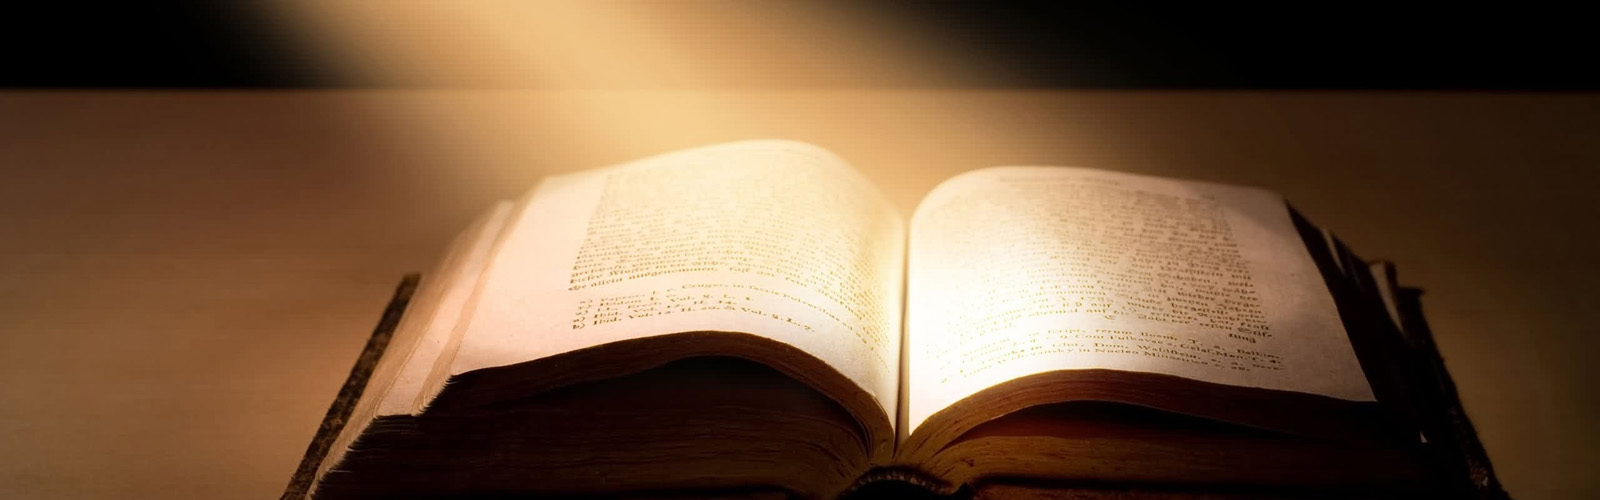 bible-light-ray-1600